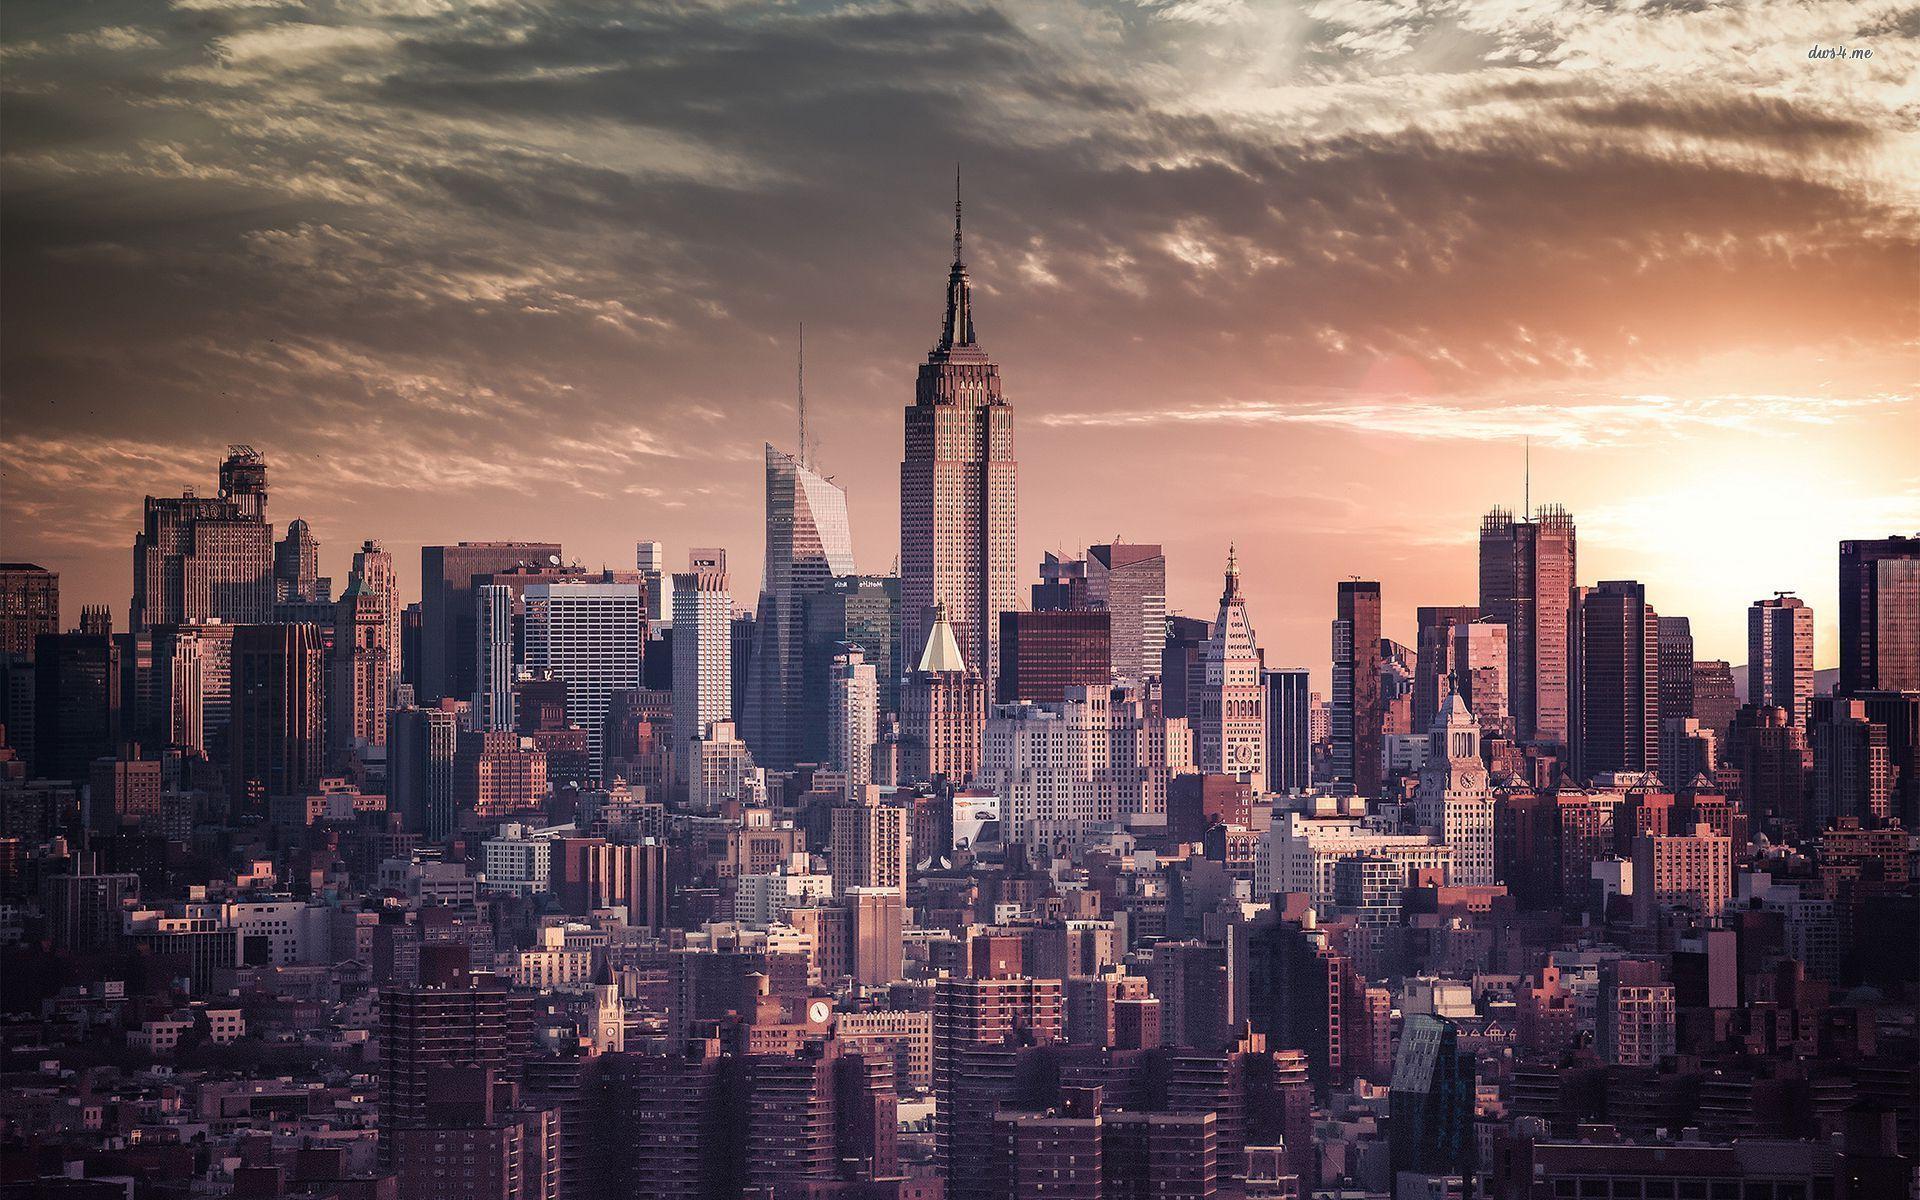 HD New York City Wallpapers Desktop Backgrounds 1920x1200